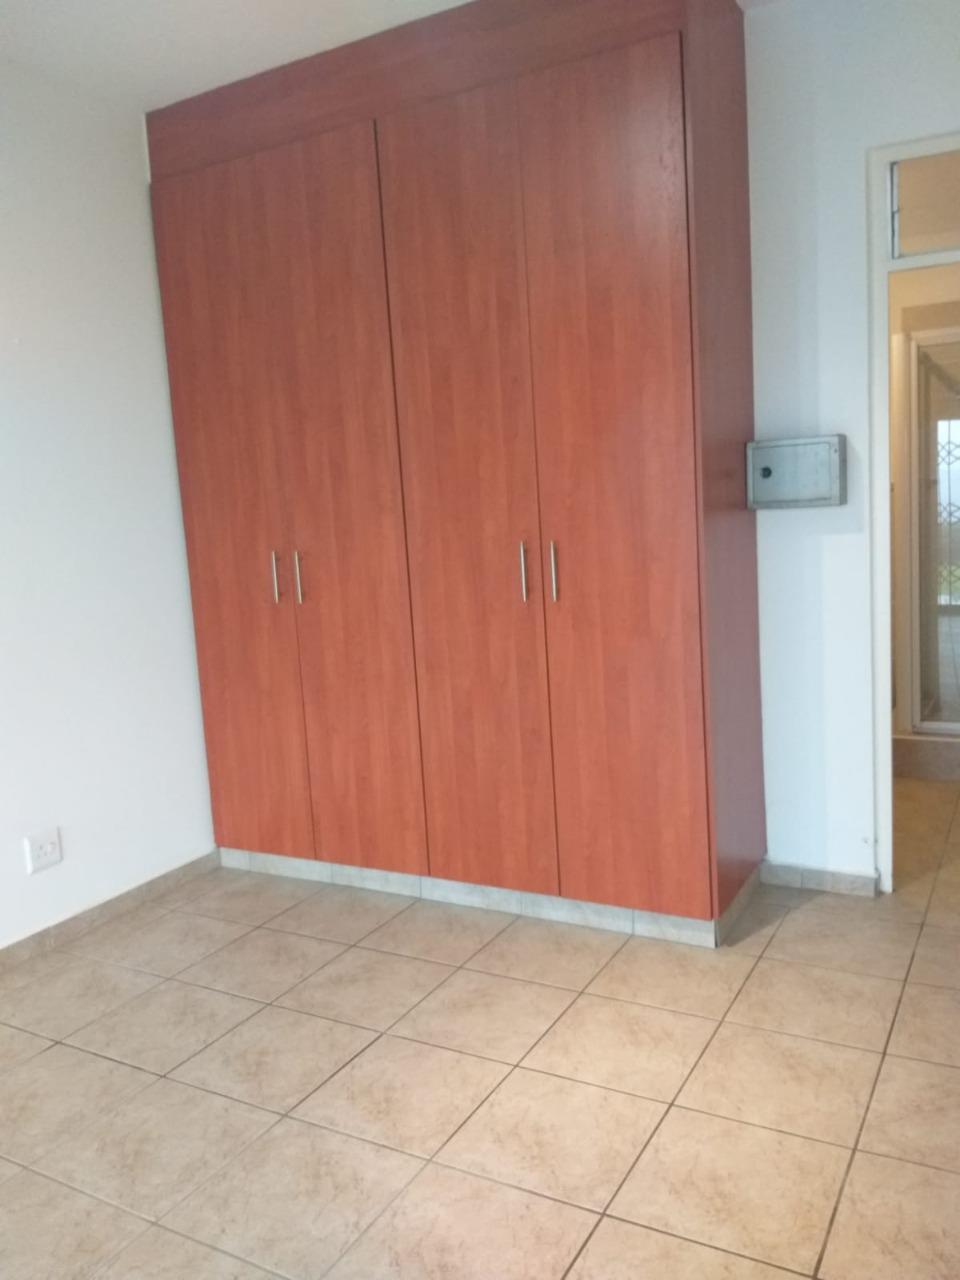 2 Bedroom Apartment / Flat For Sale in Desainagar